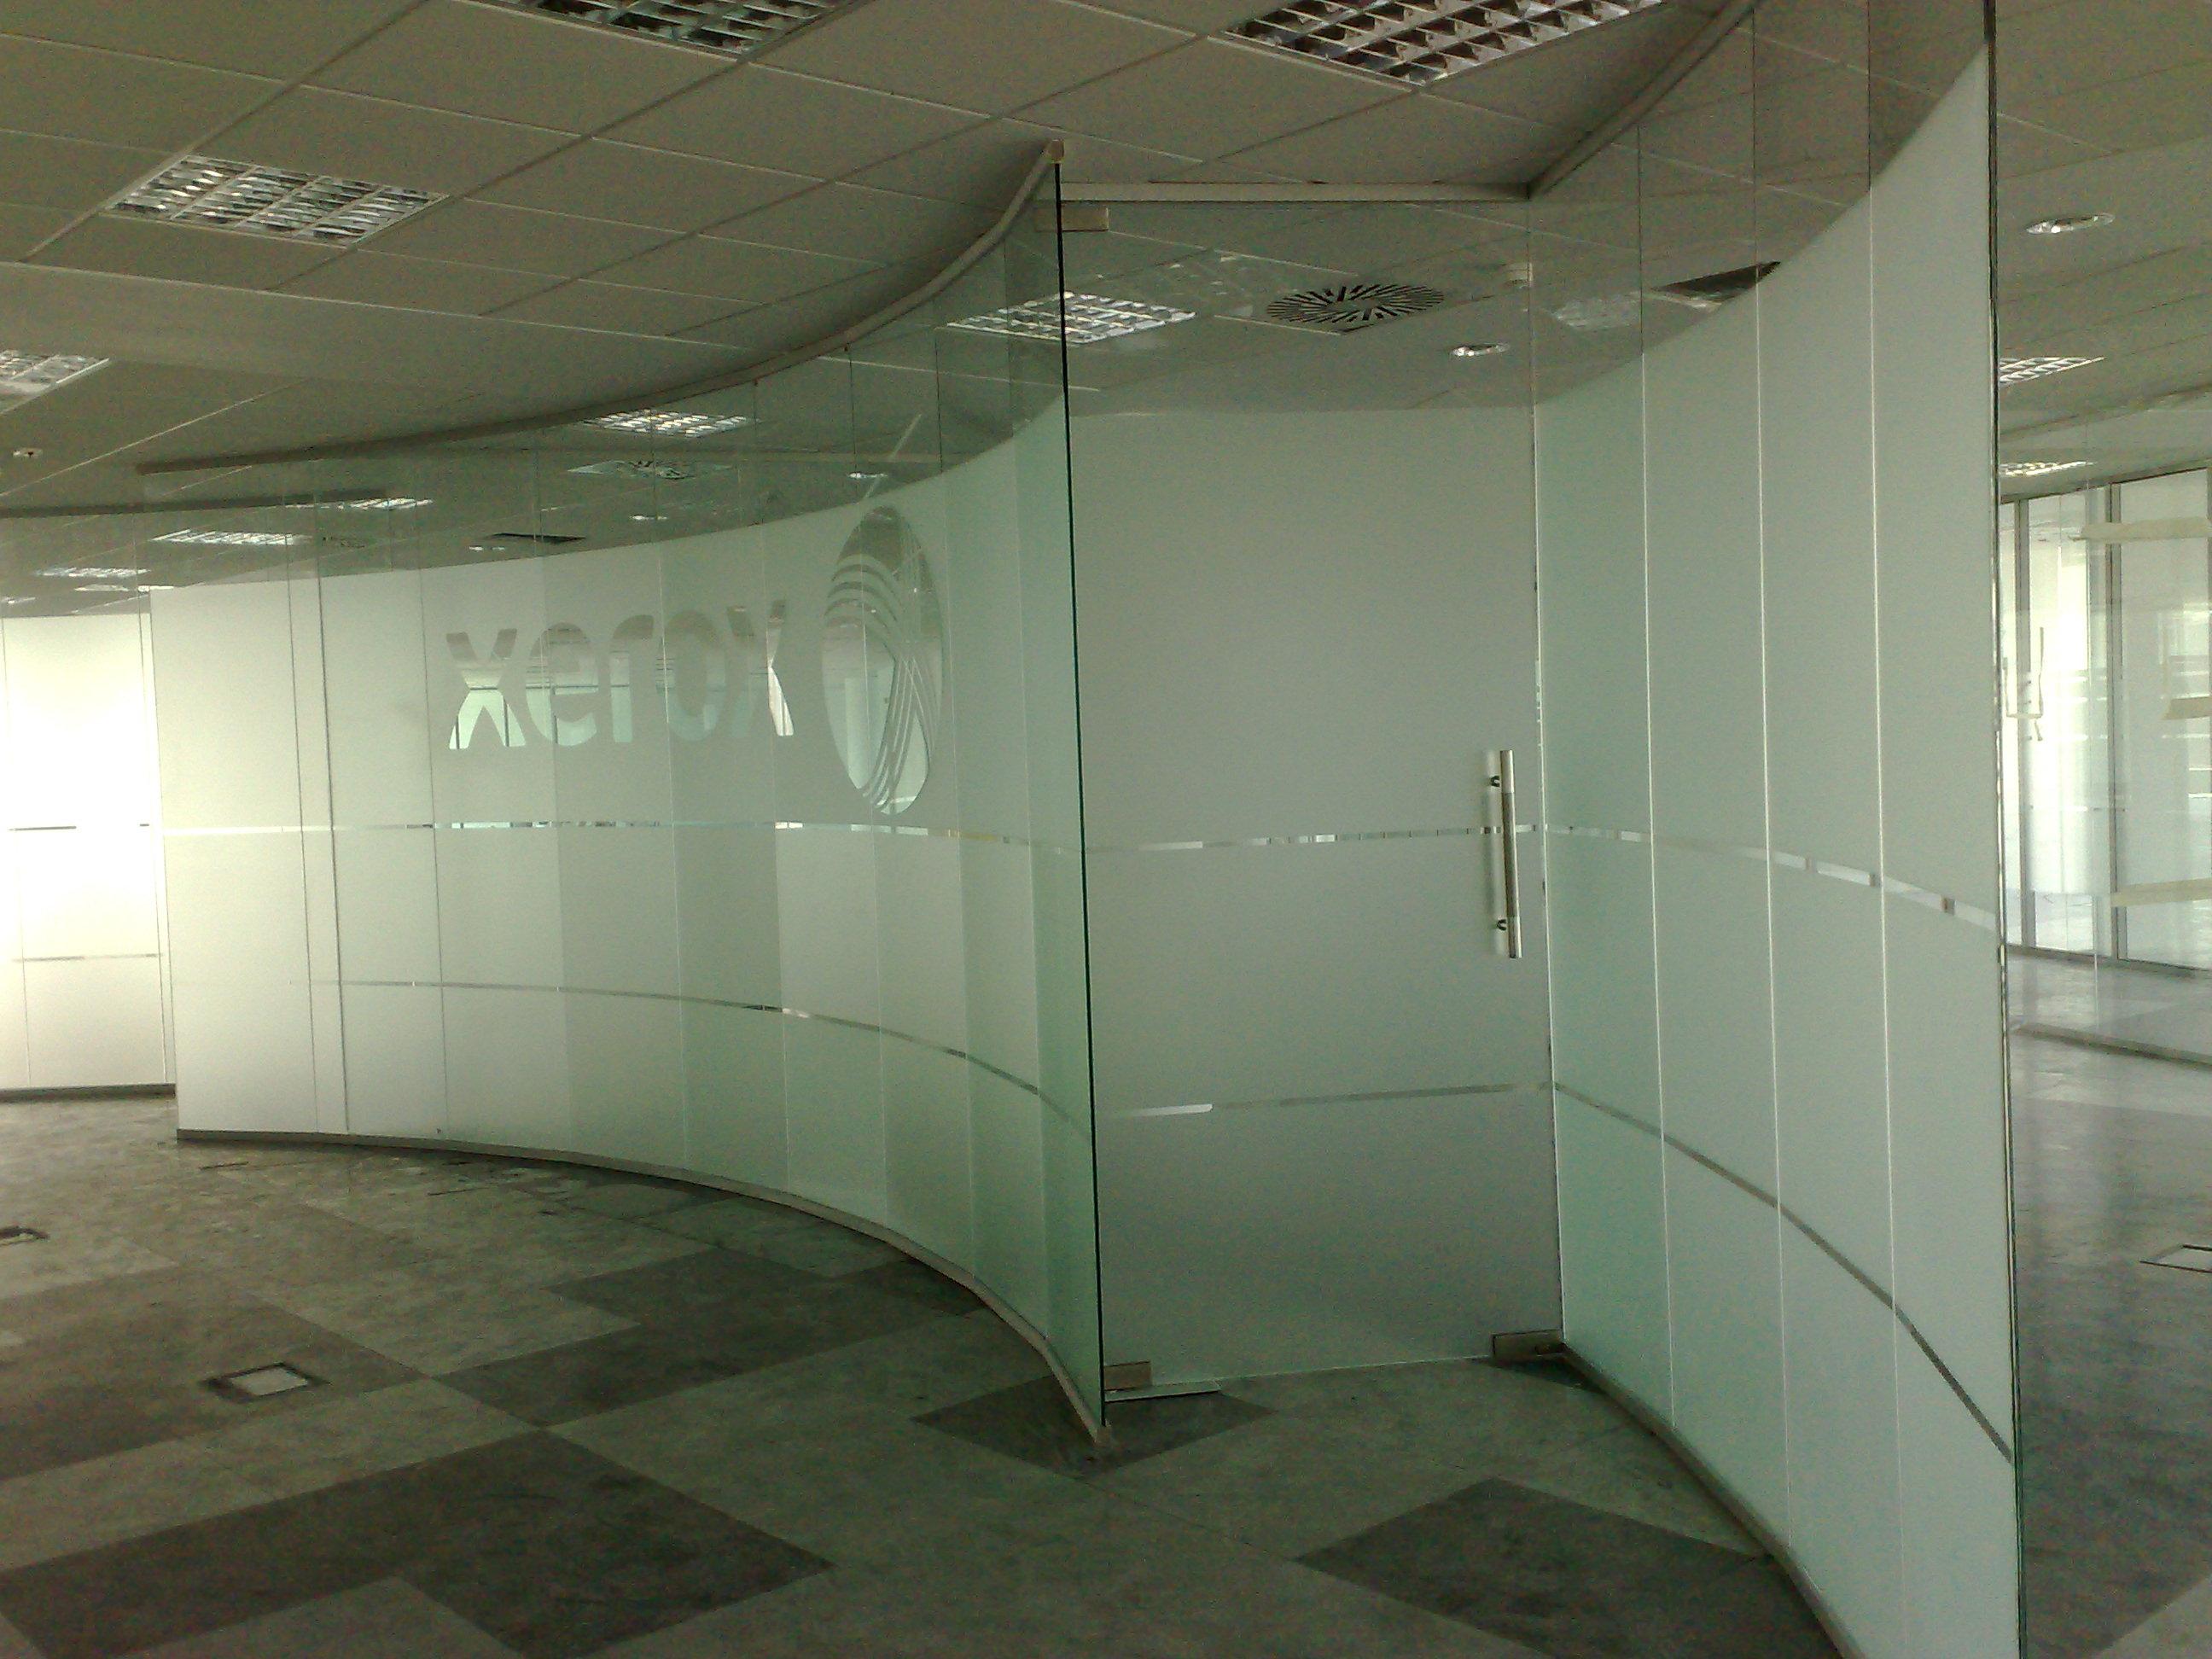 Pereti modulari din sticla, demontabili CLIPS - Poza 2